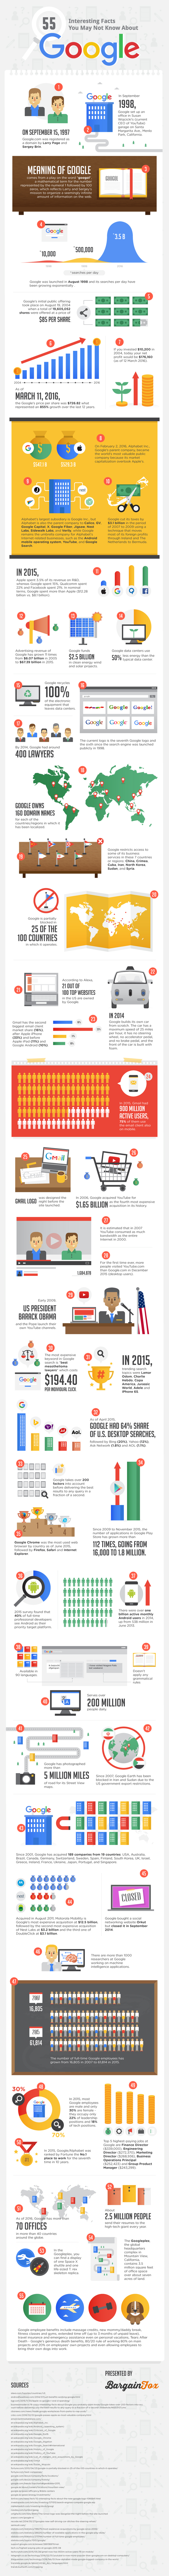 55 datos sobre Google que debes conocer